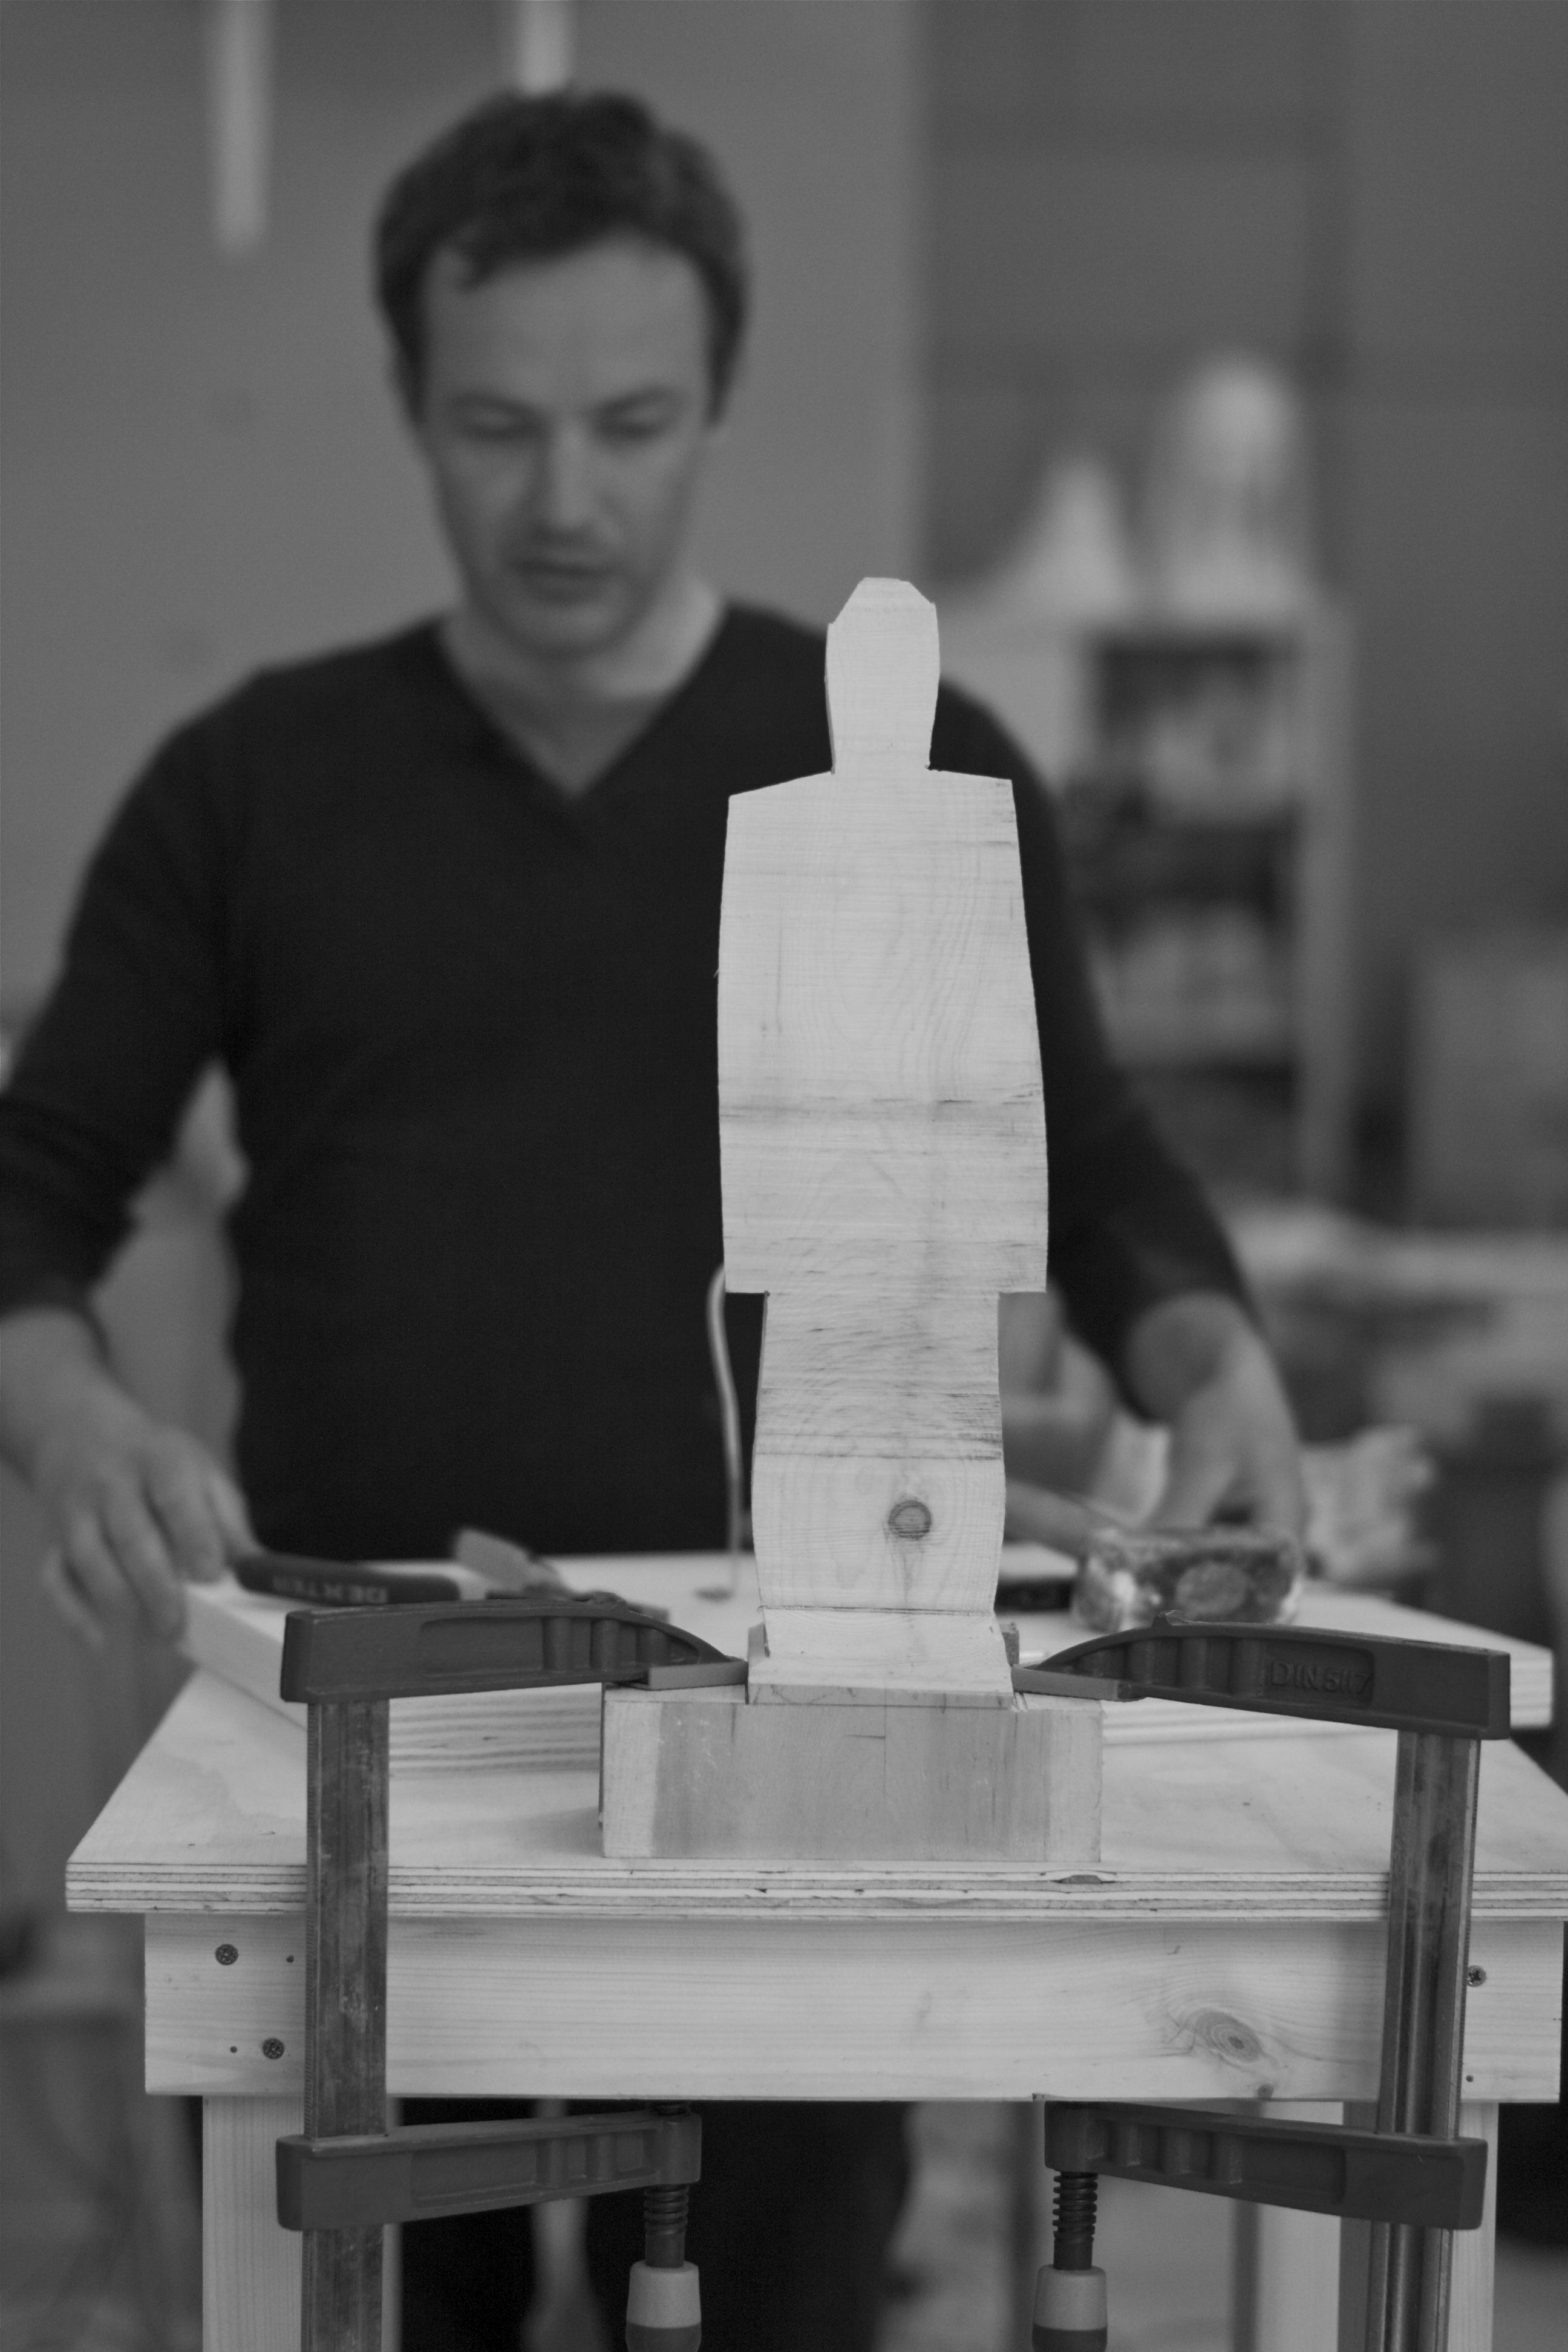 Flickr - Aron Demetz - Dialoghi e materia - Workshop a cura di Franco Reina25